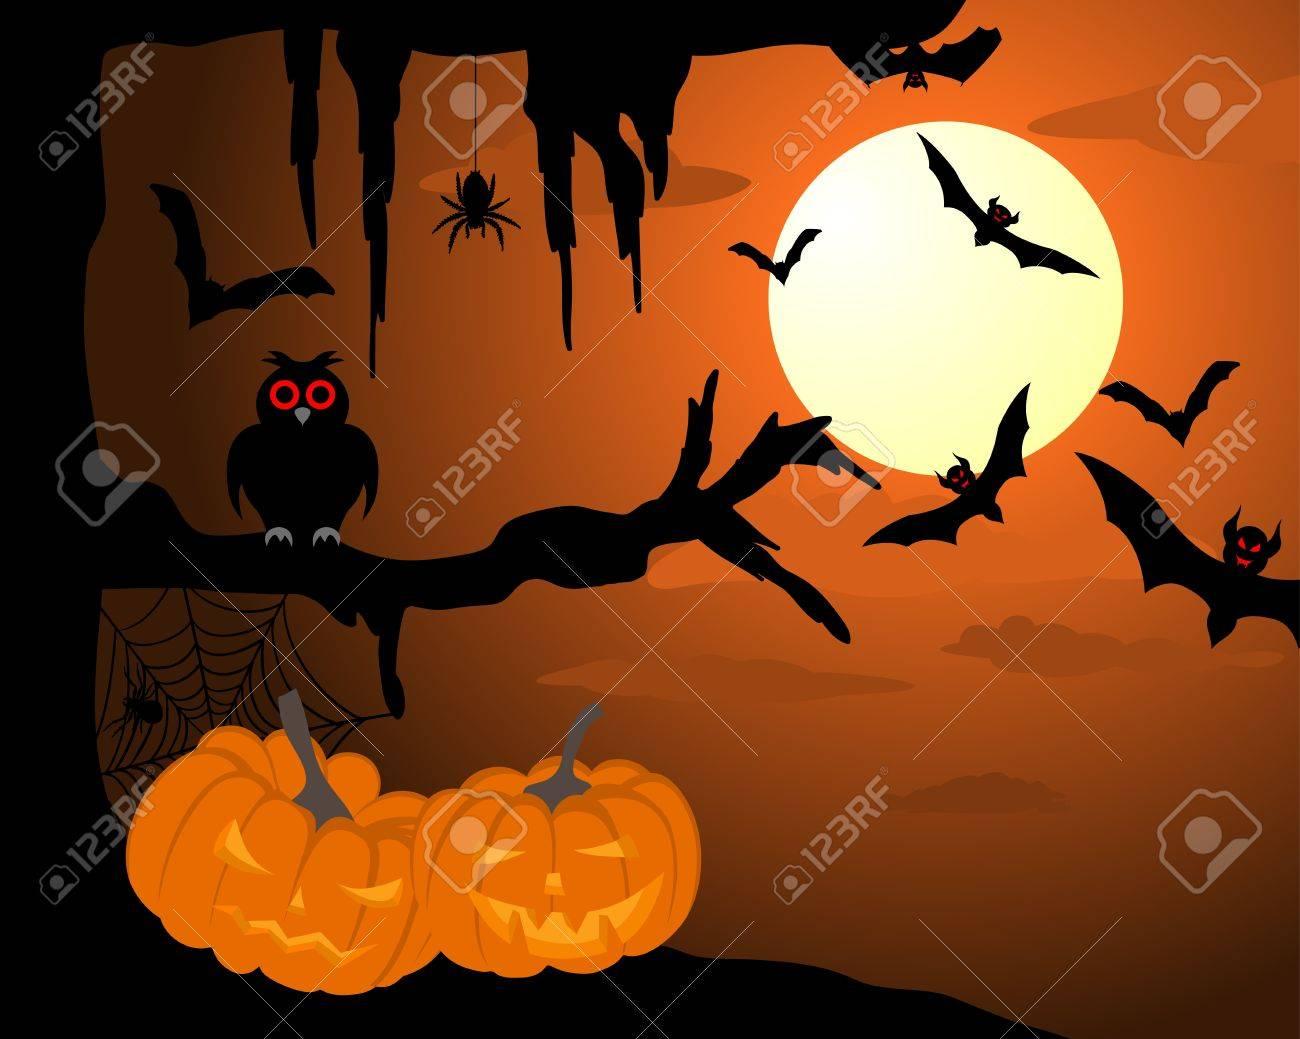 Happy halloween theme greeting card. illustration. Stock Vector - 14899185